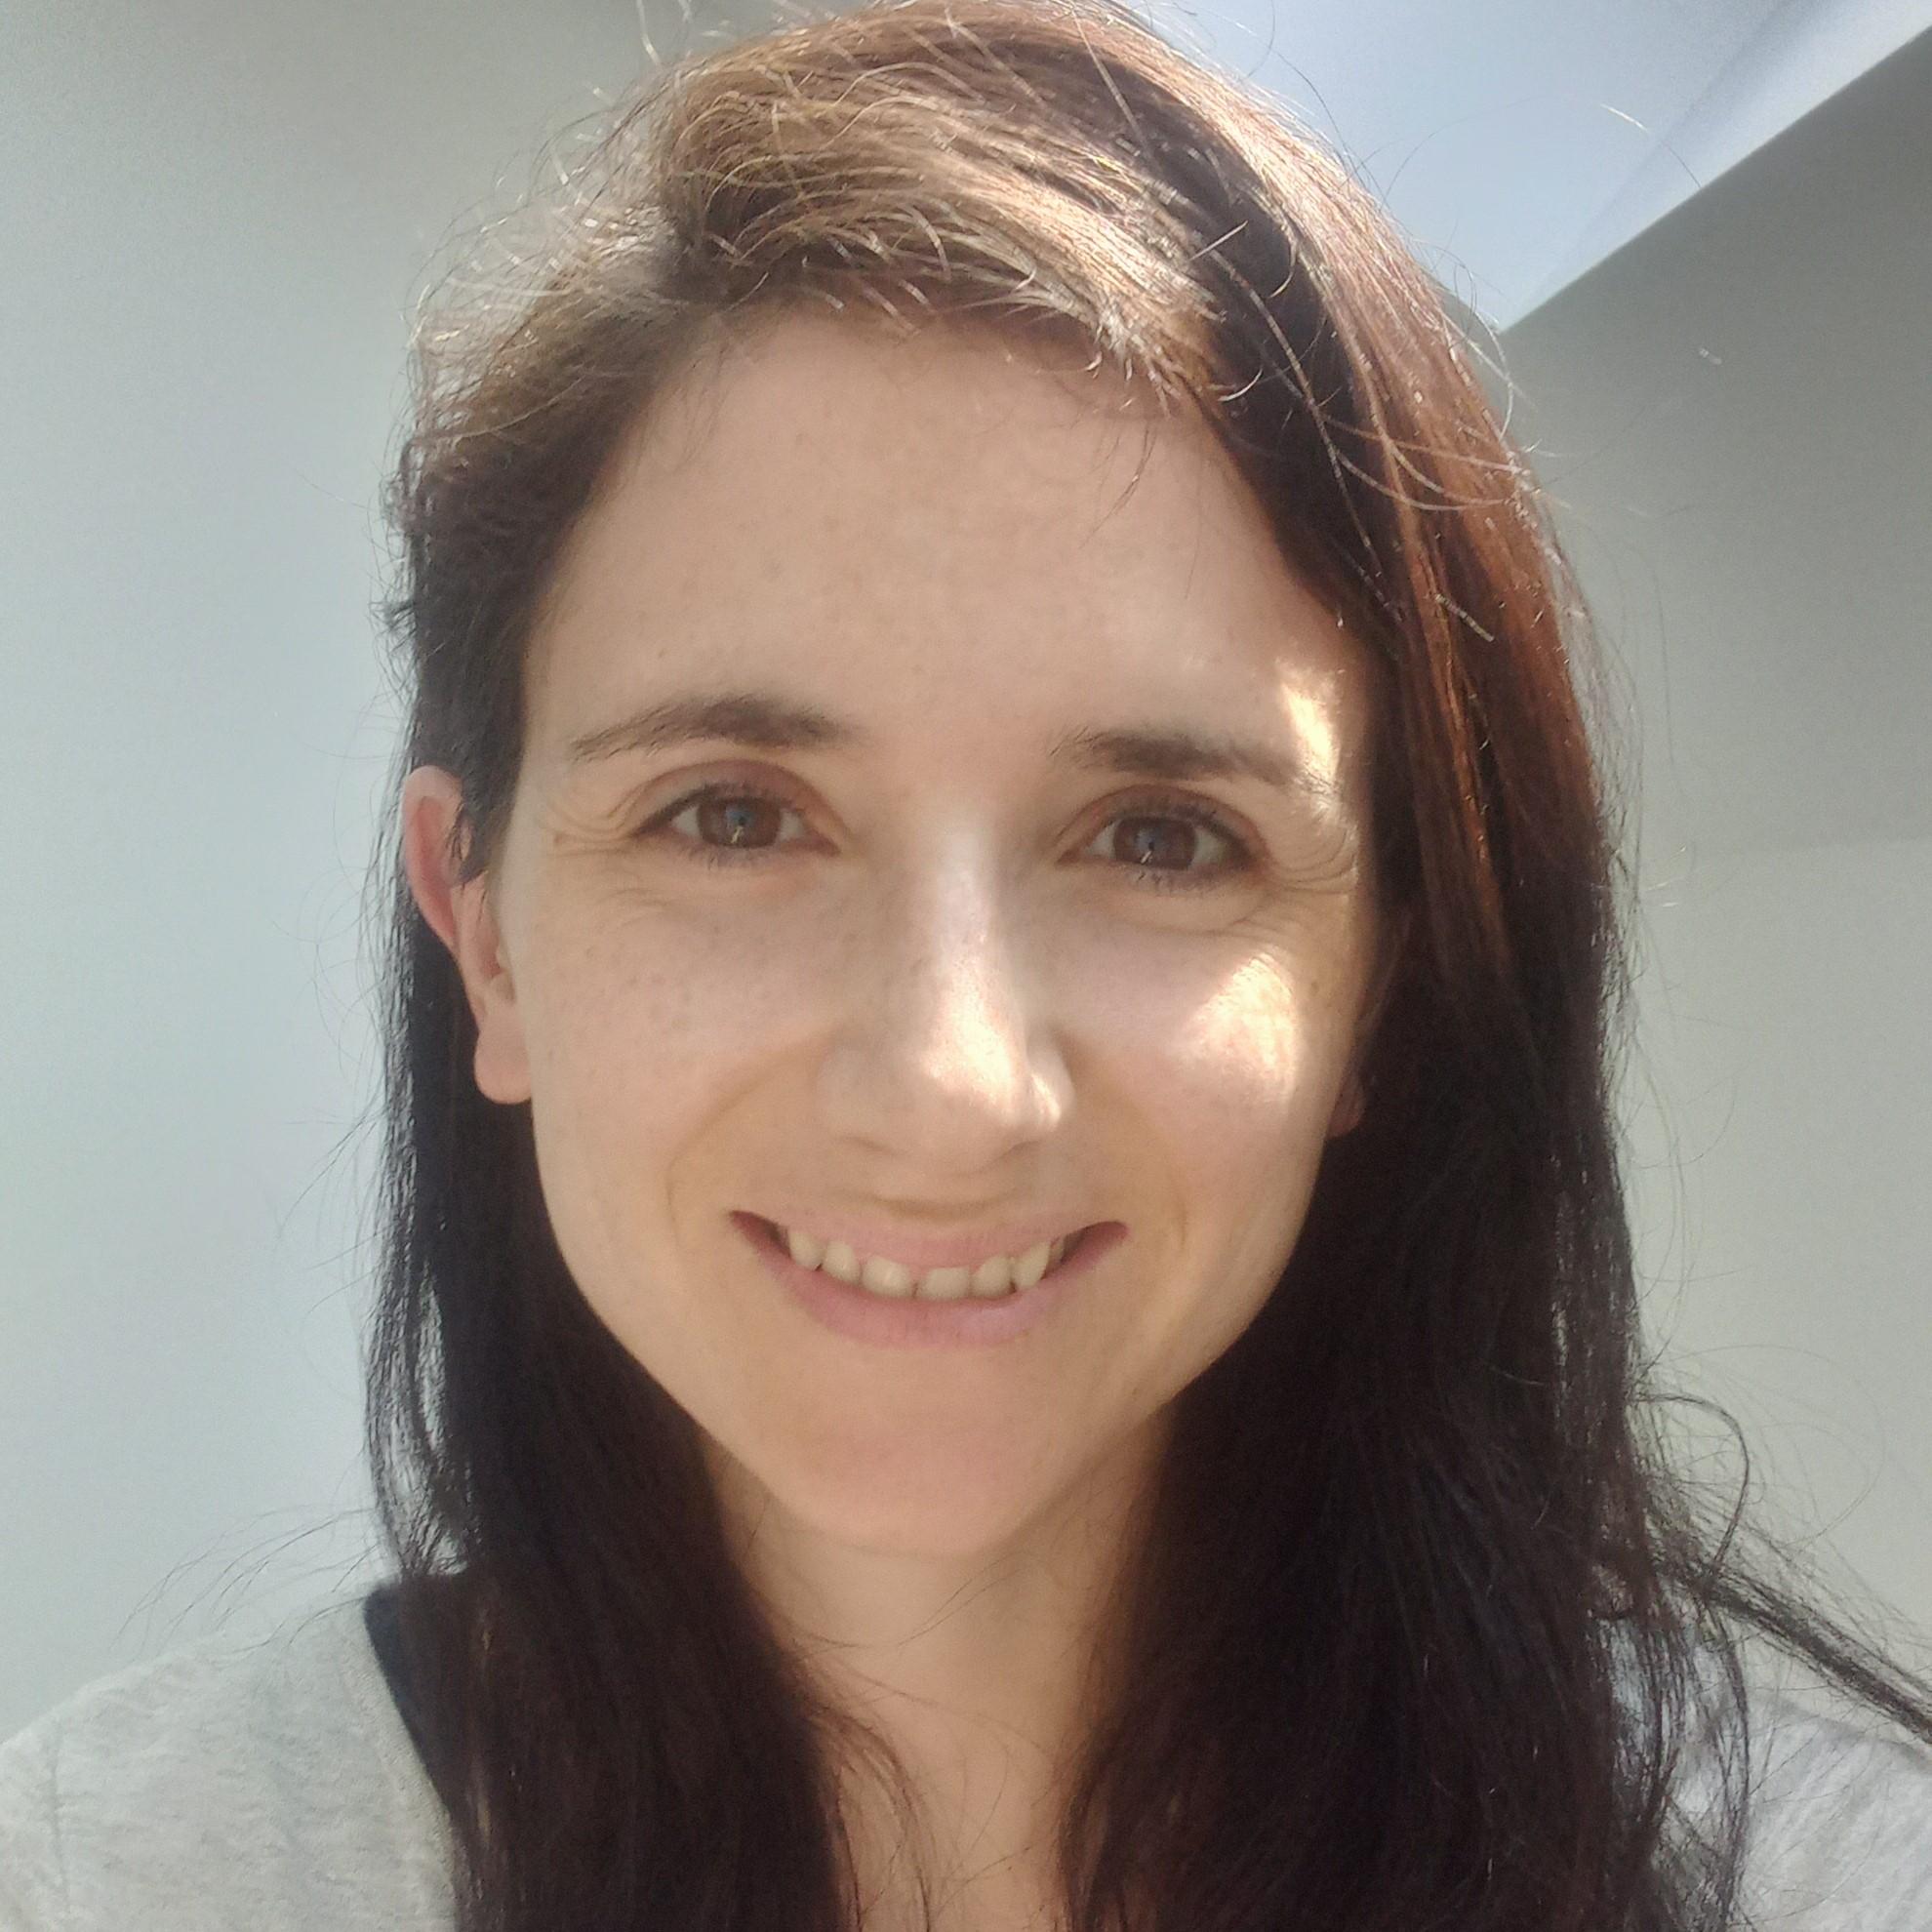 Chloe Douglas